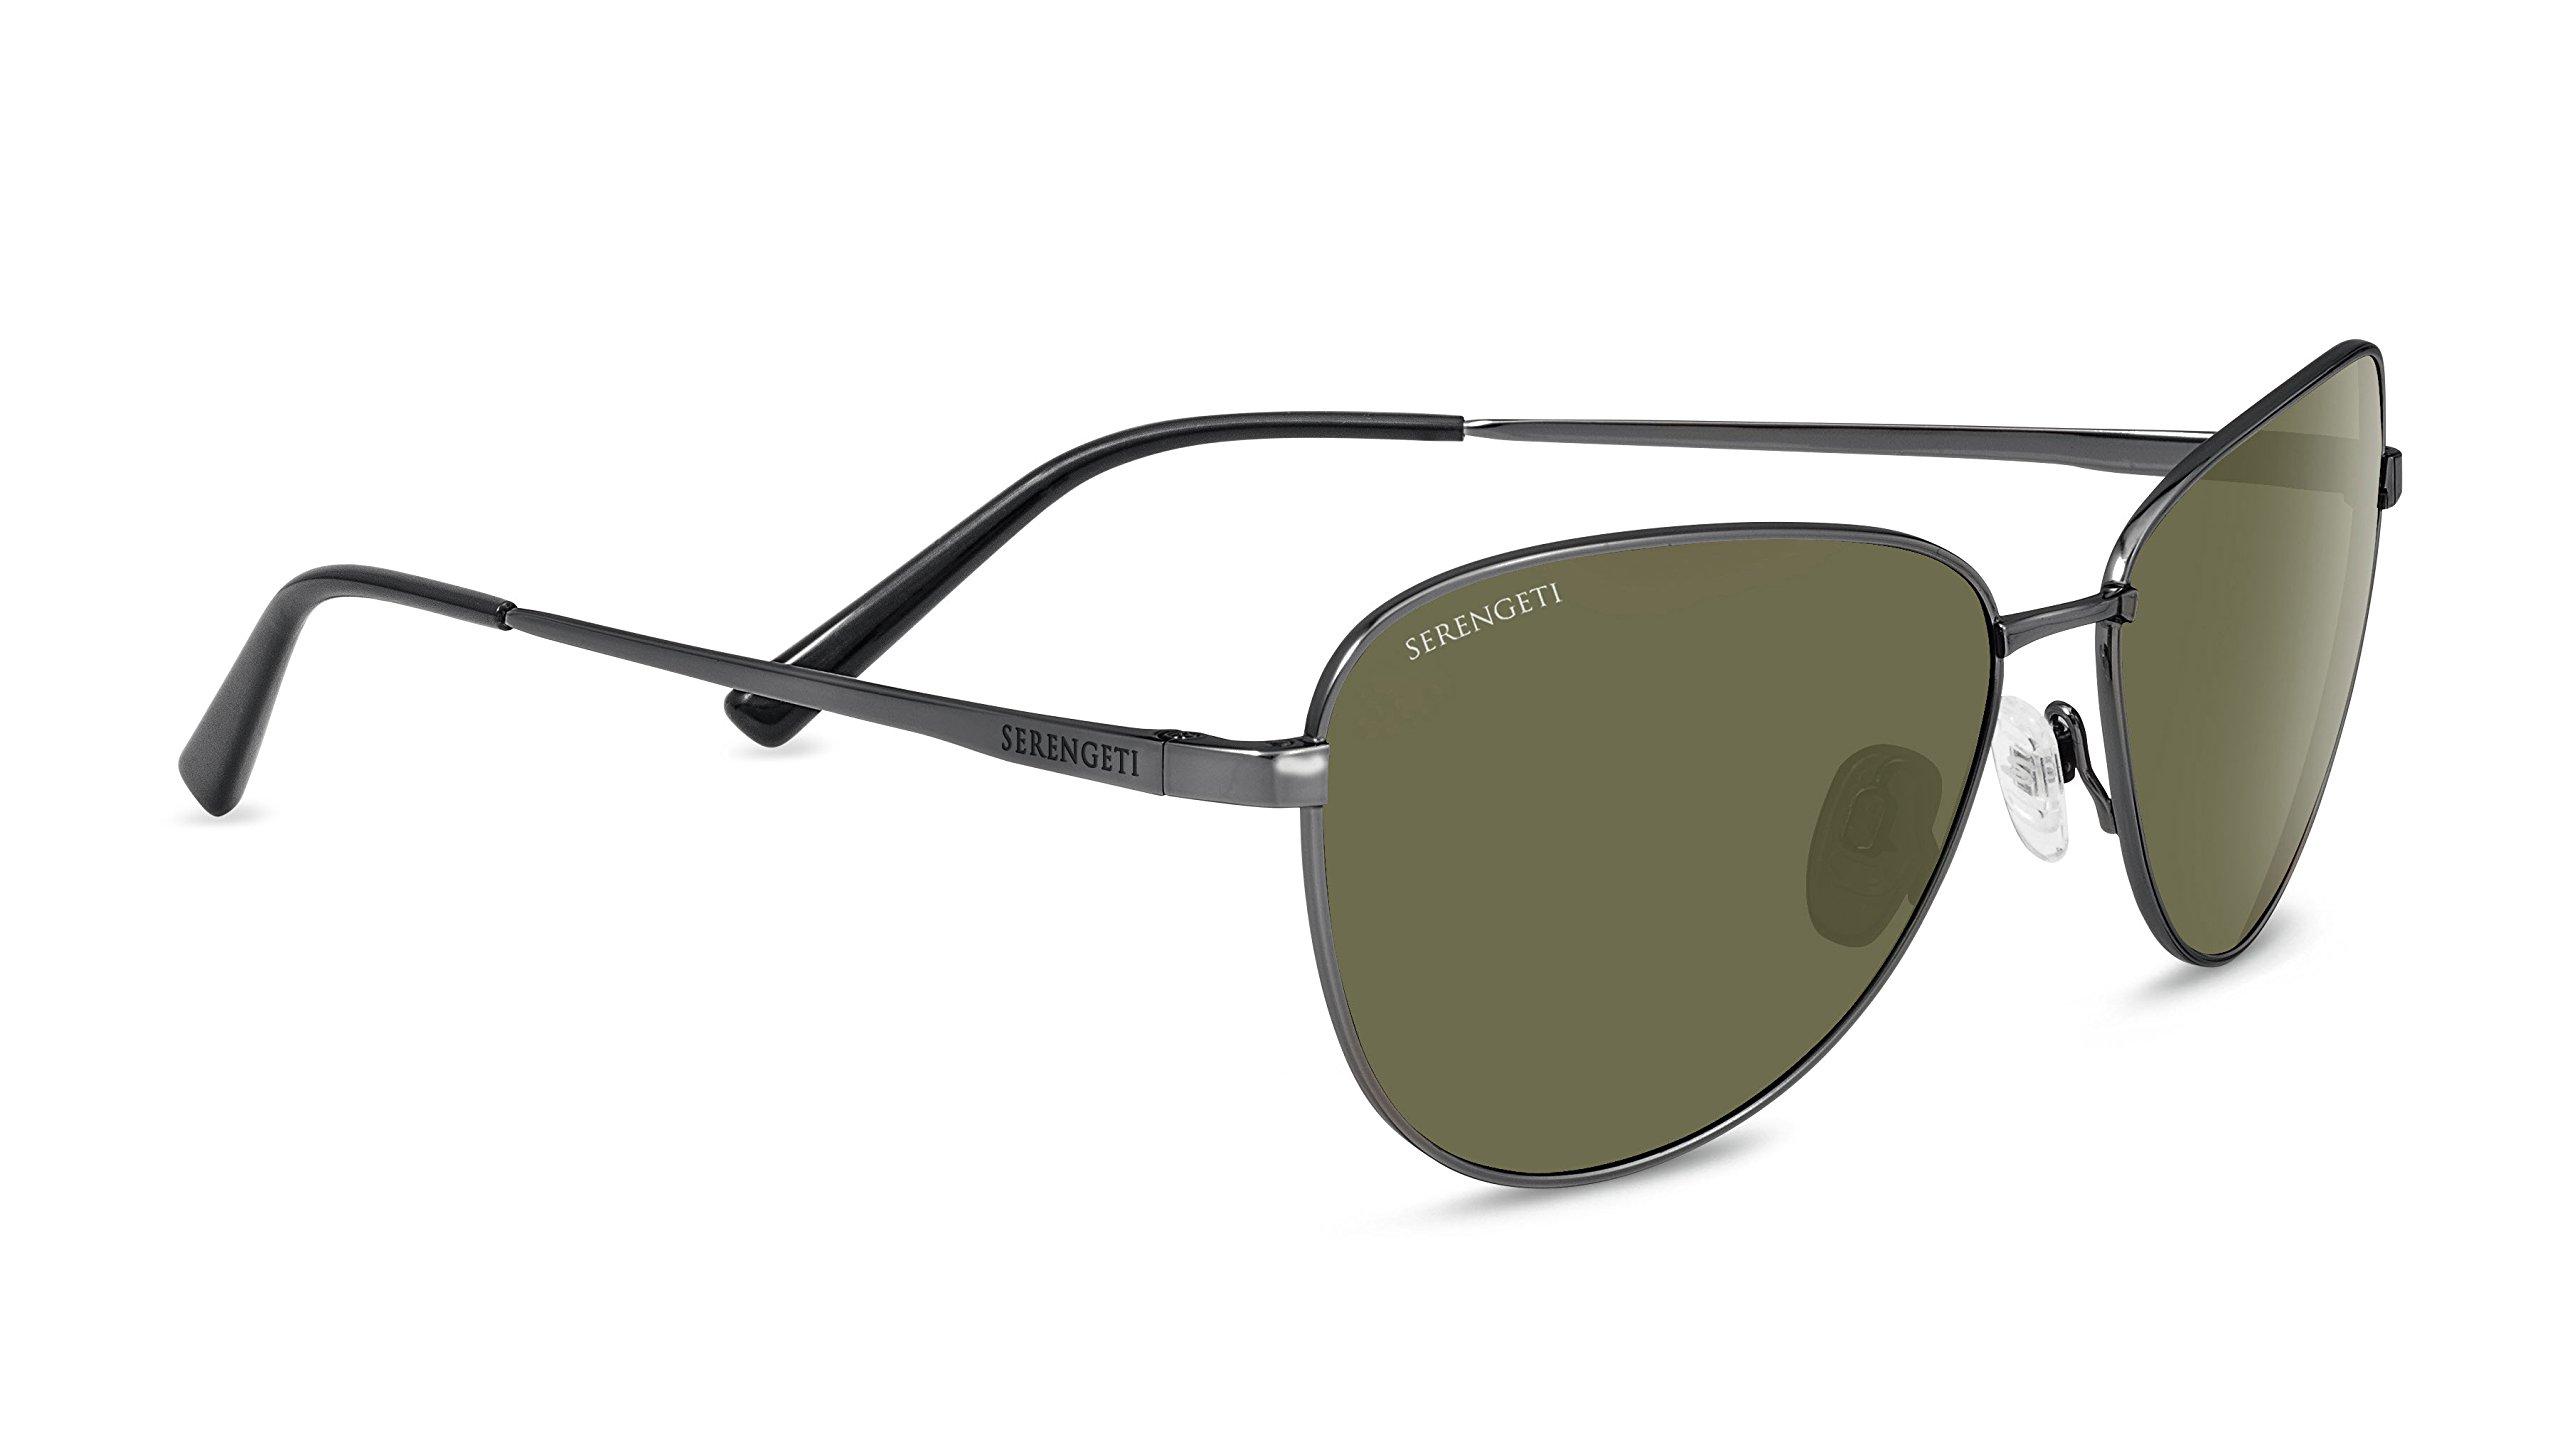 Serengeti Cosmopolitan Gloria Sunglasses Satin Dark Gunmetal, Green